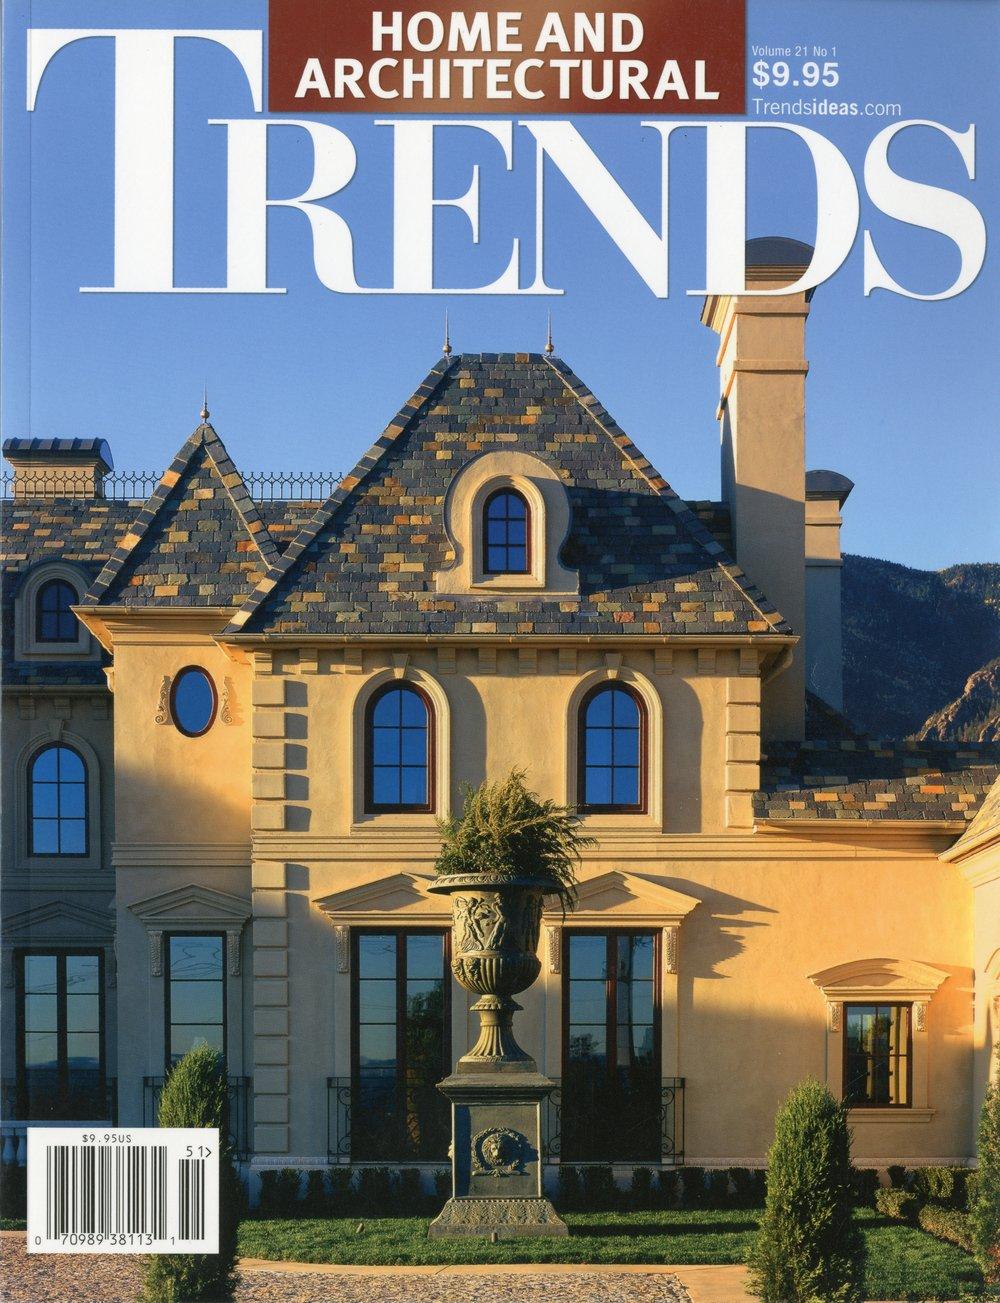 Trends001.jpg